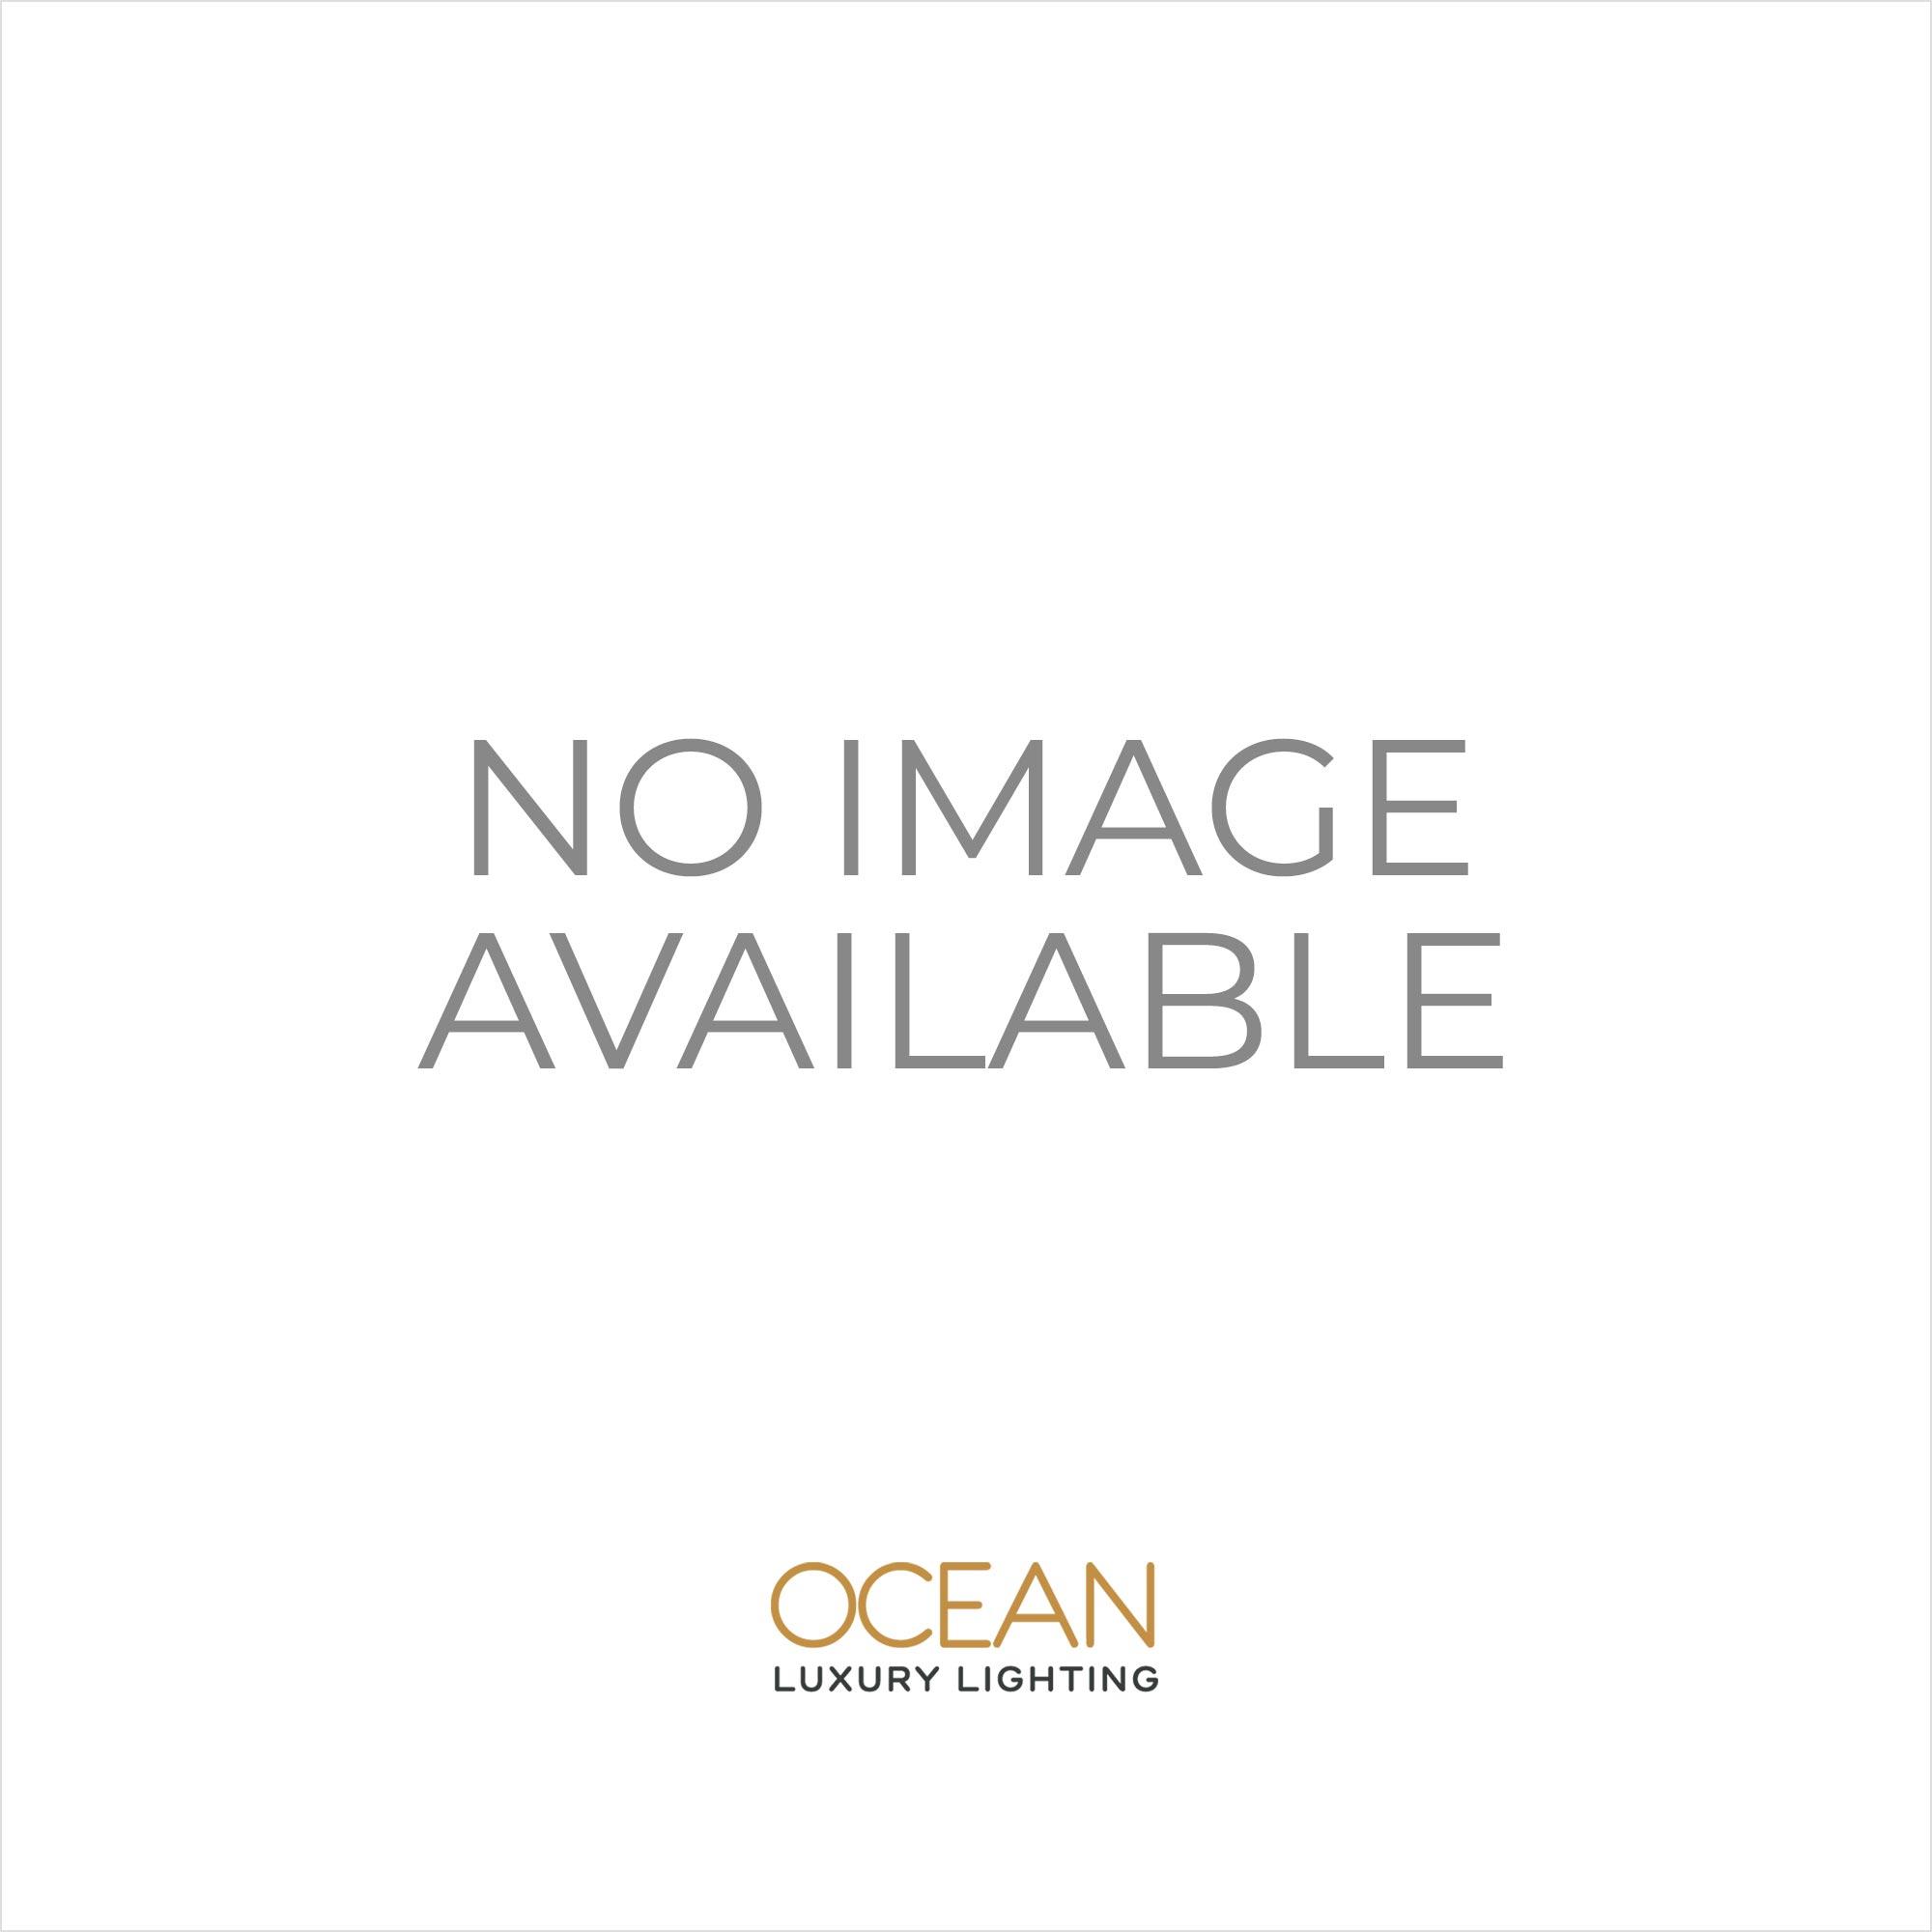 Astro 7566 borgo mini trimless recessed led wall light floor washer 7566 borgo mini trimless recessed led wall light floor washer mozeypictures Gallery